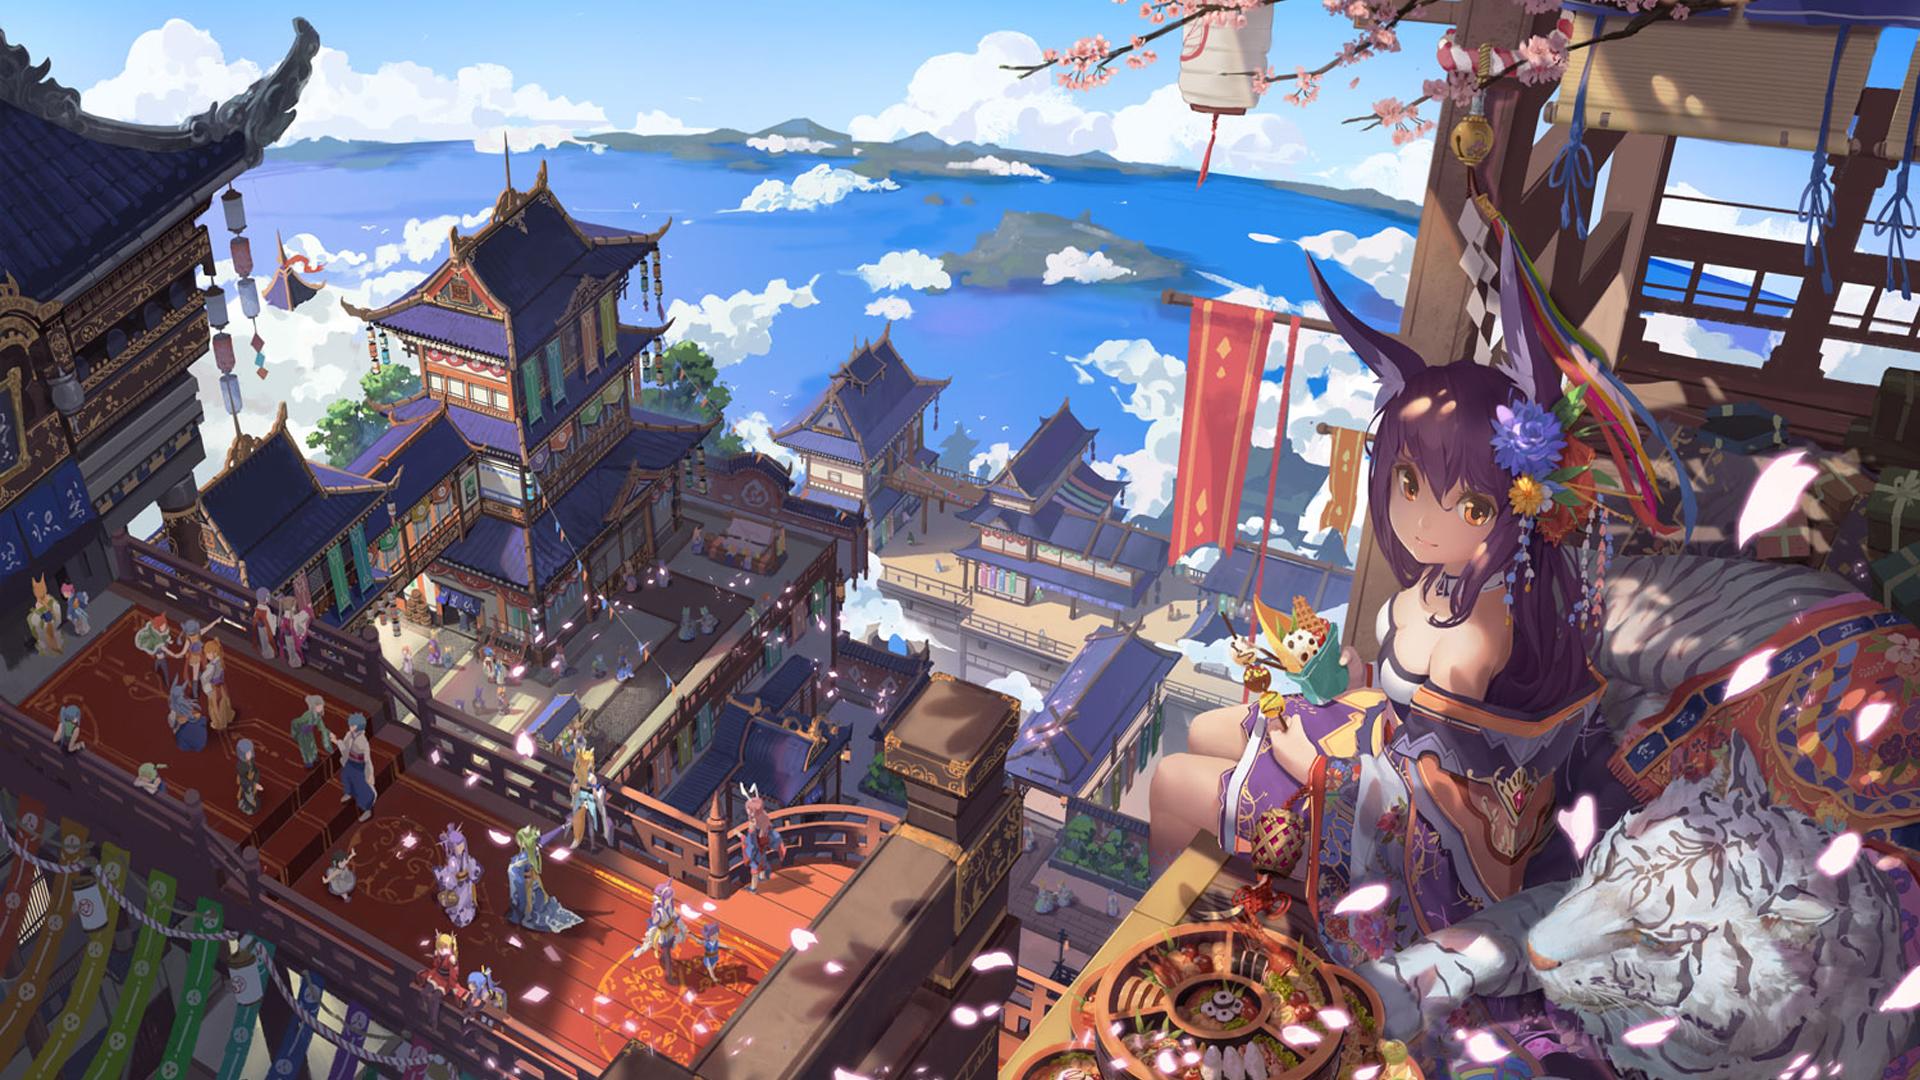 Anime original wallpaper